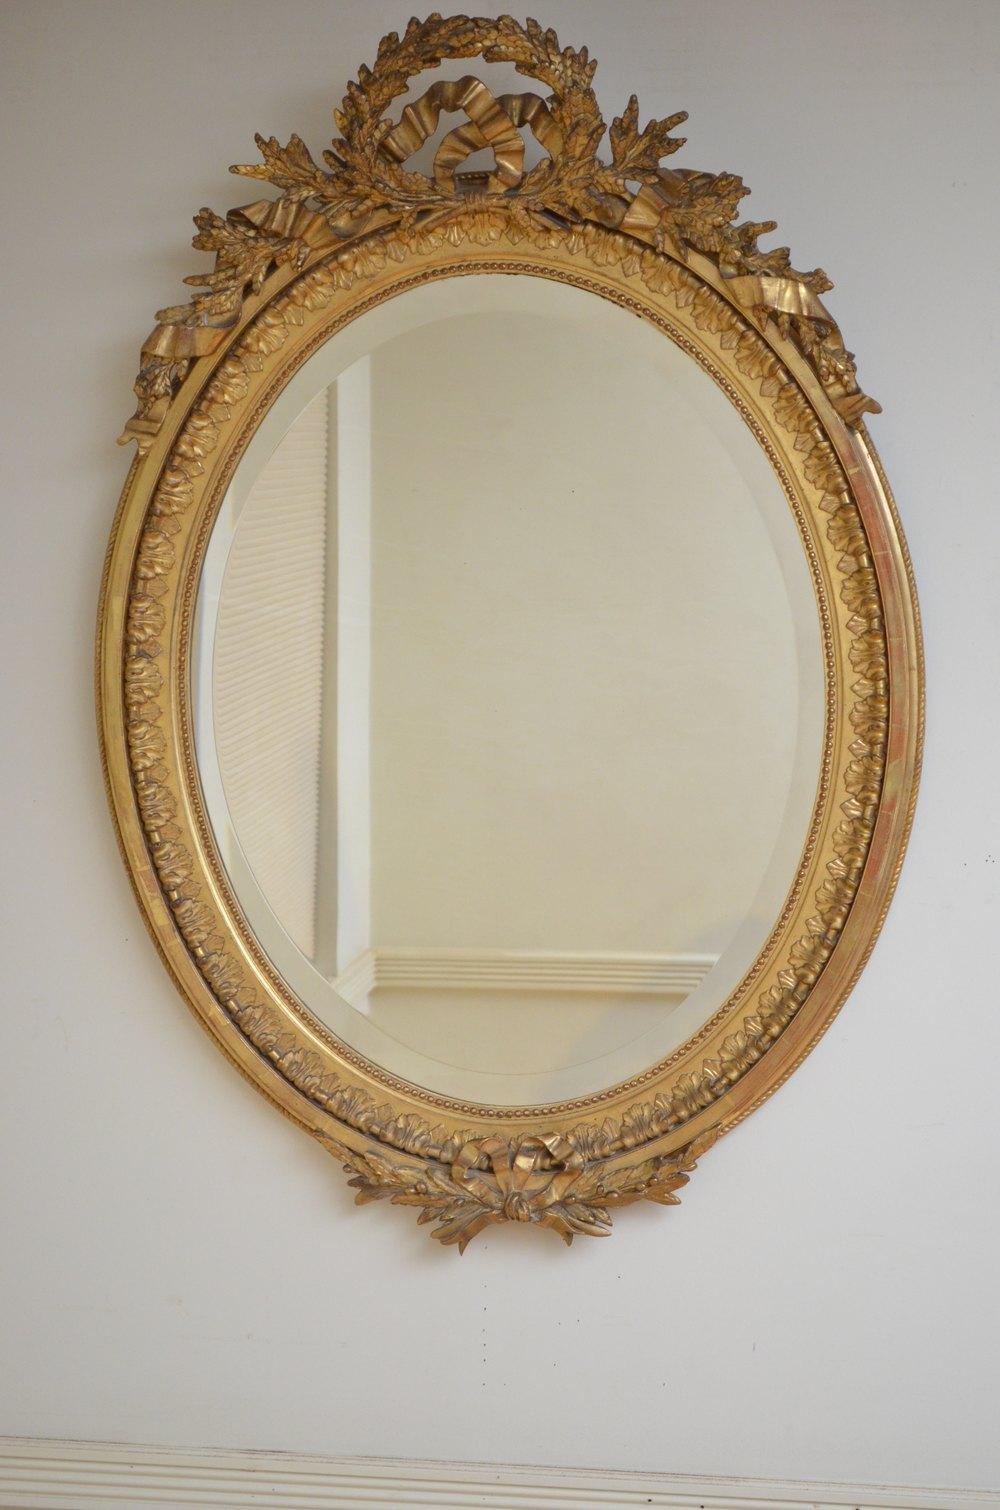 Pin by Mehreen mehr on iPhone mirror selfie | Mirror